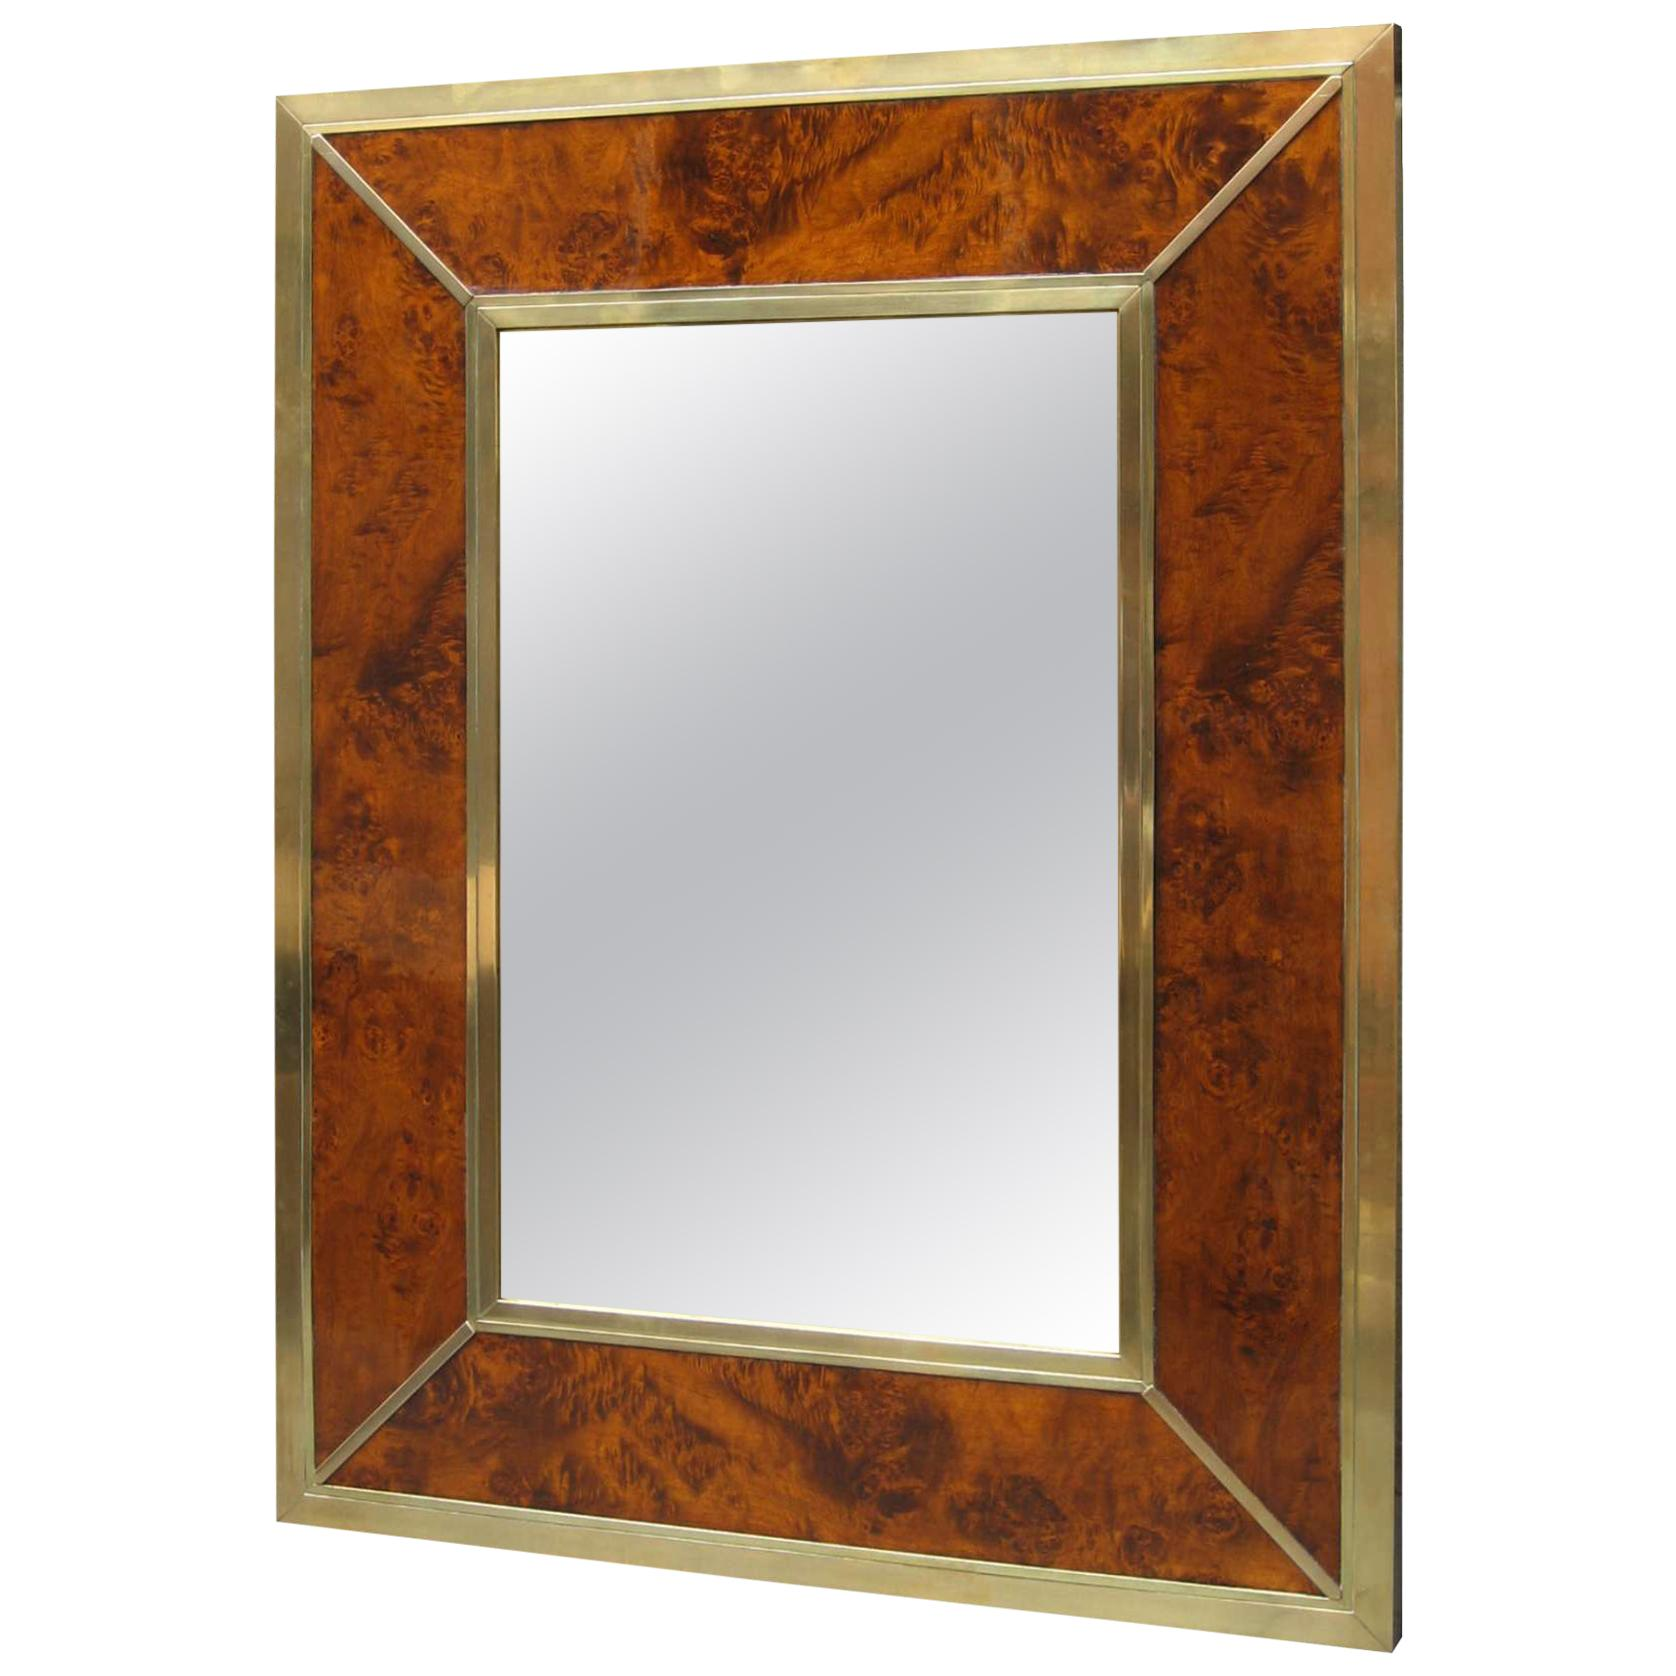 Modernist Midcentury Wall Mirror